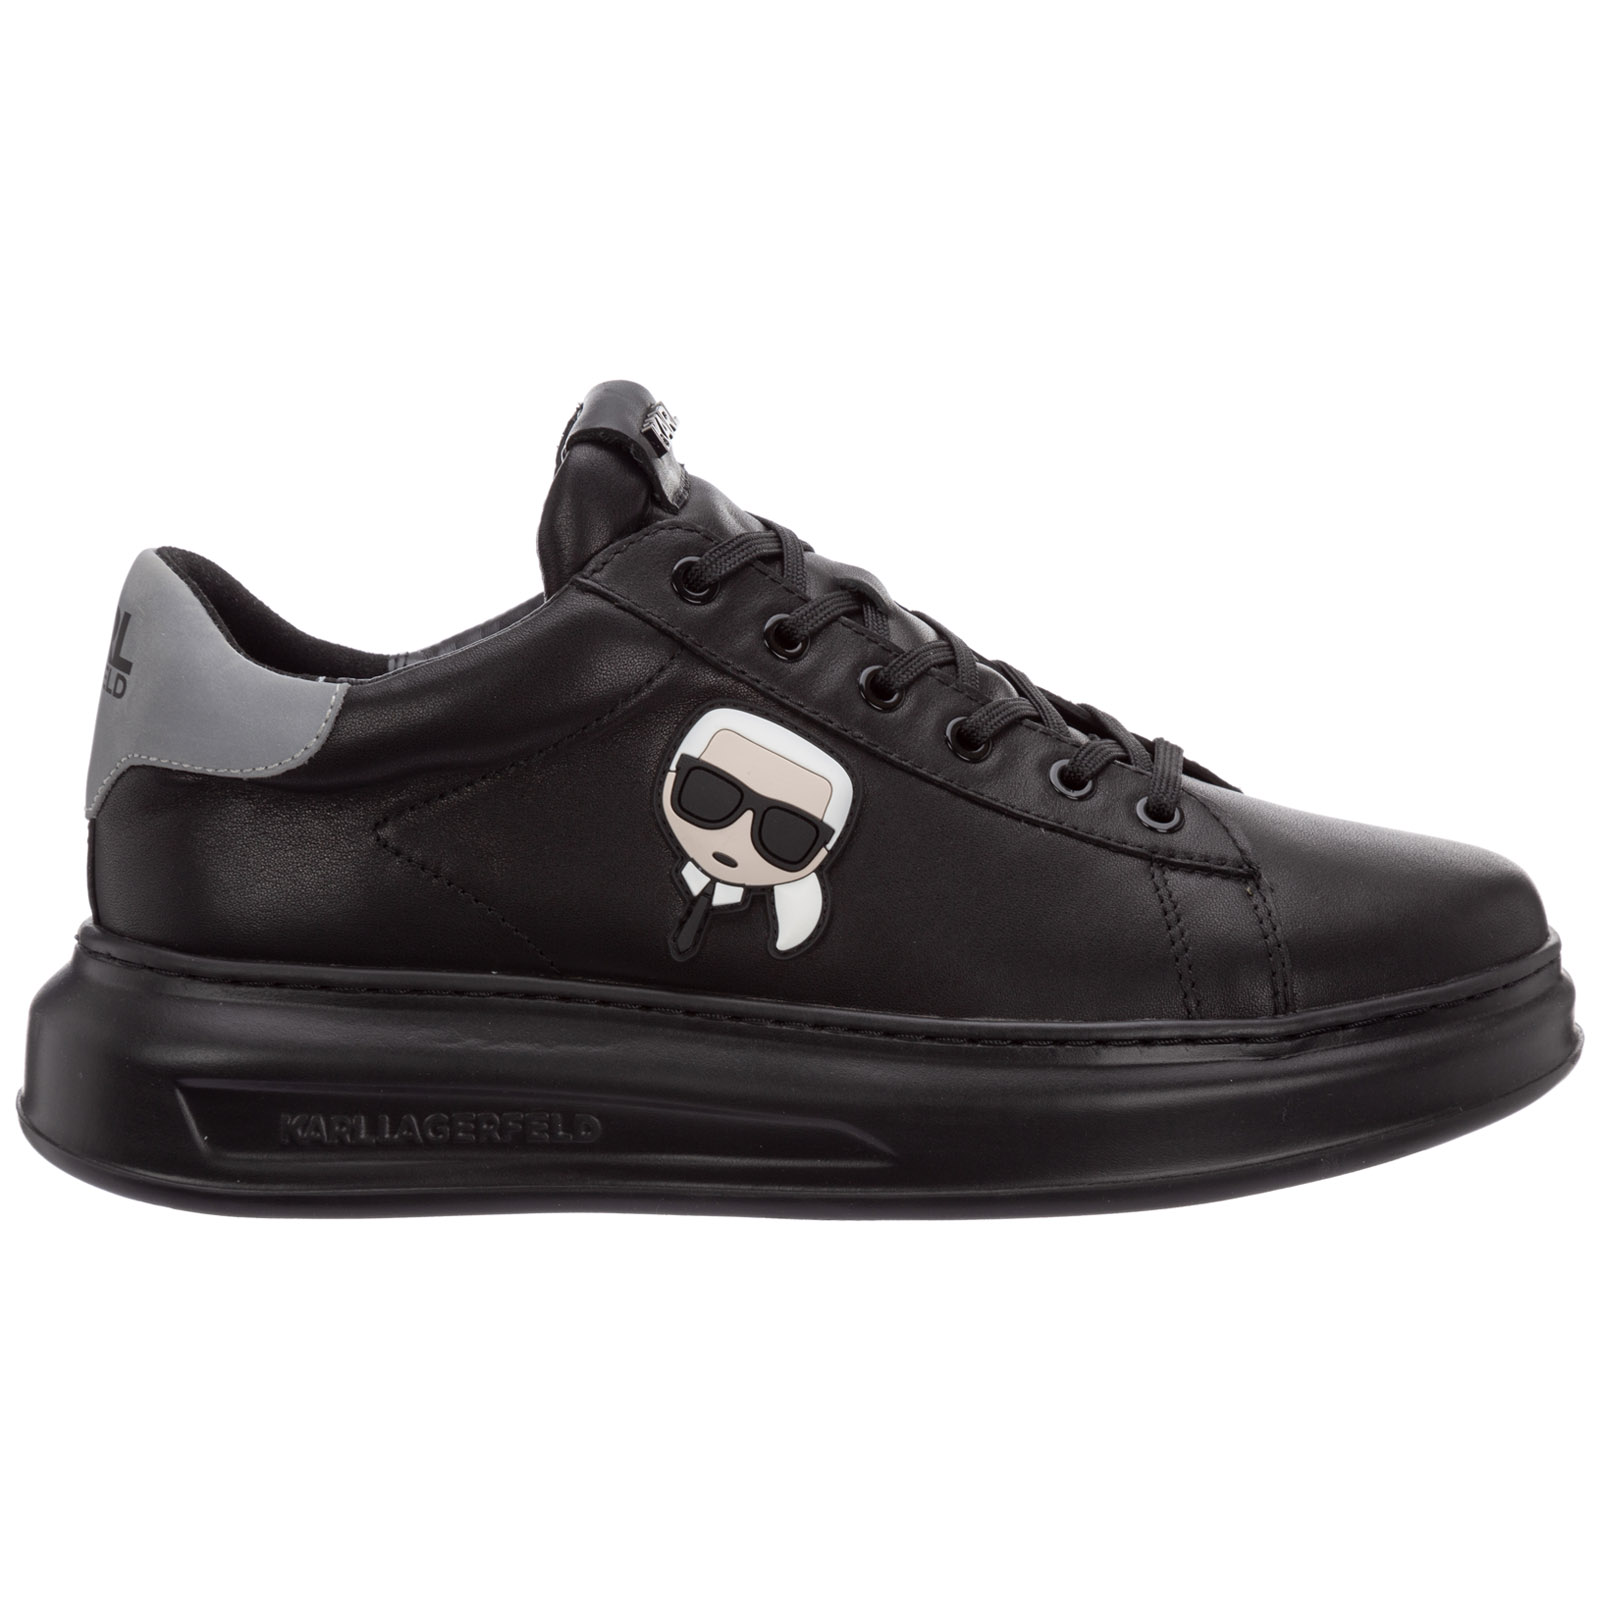 karl lagerfeld man shoes